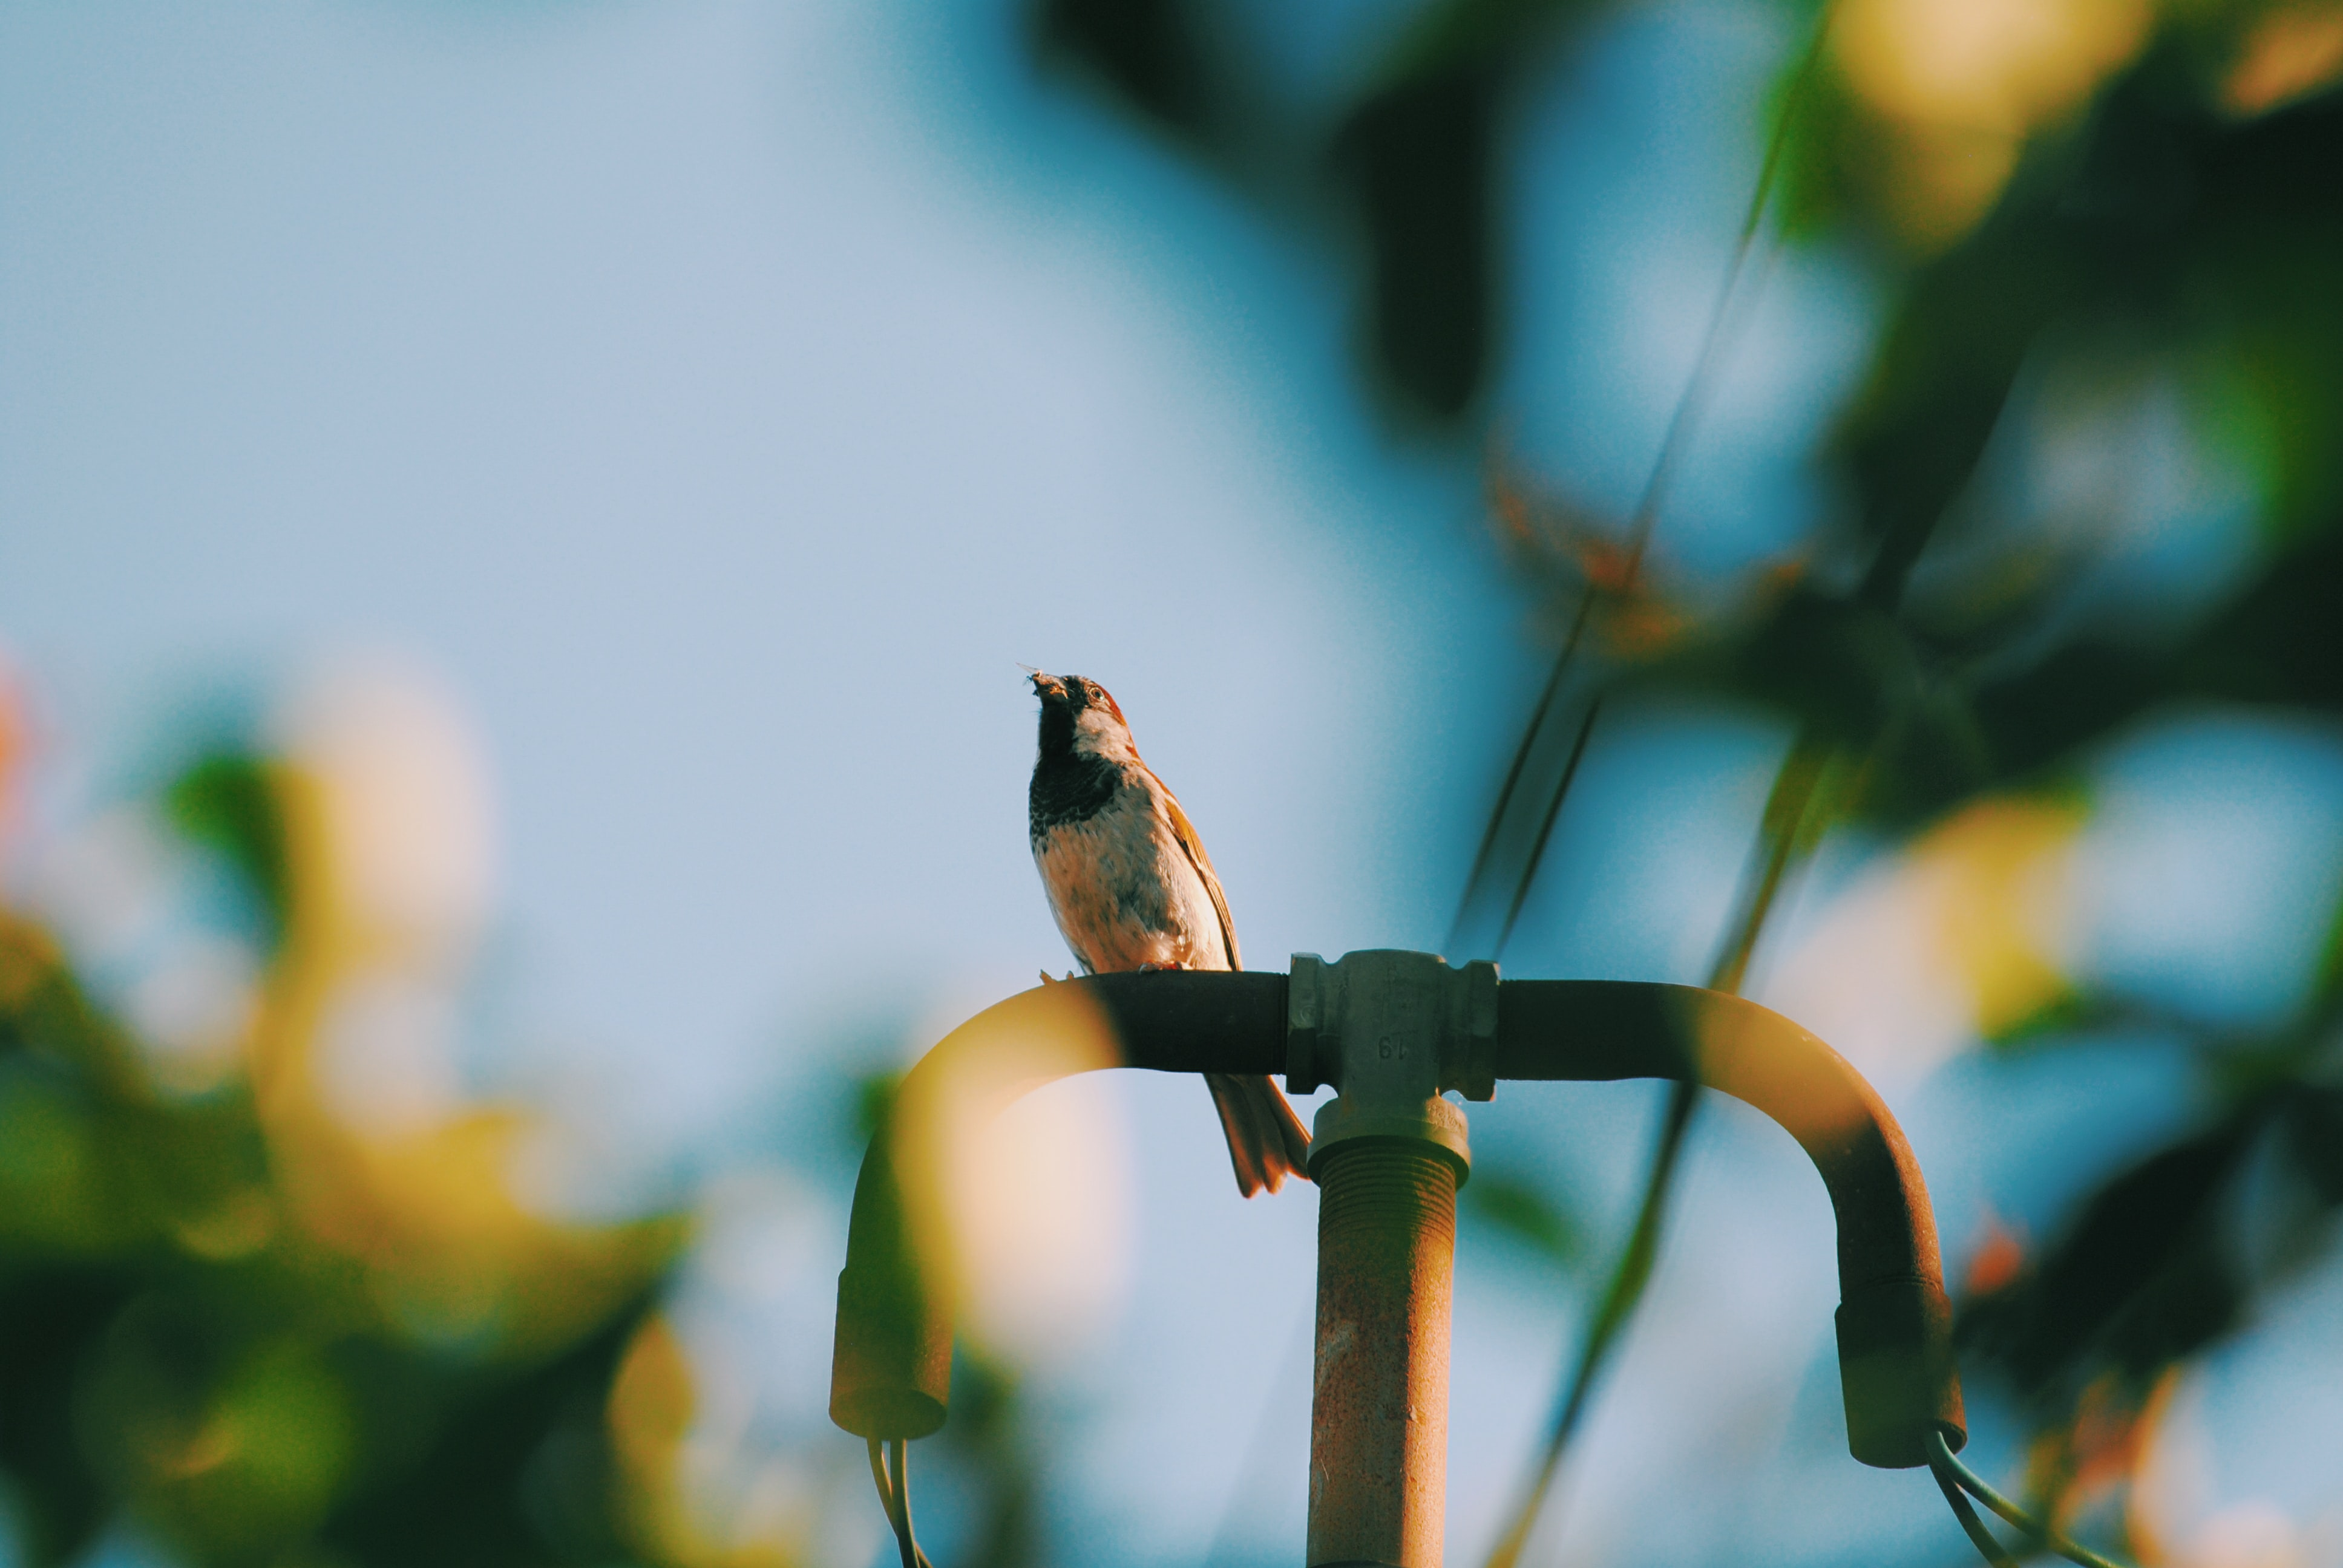 bird perched on street light